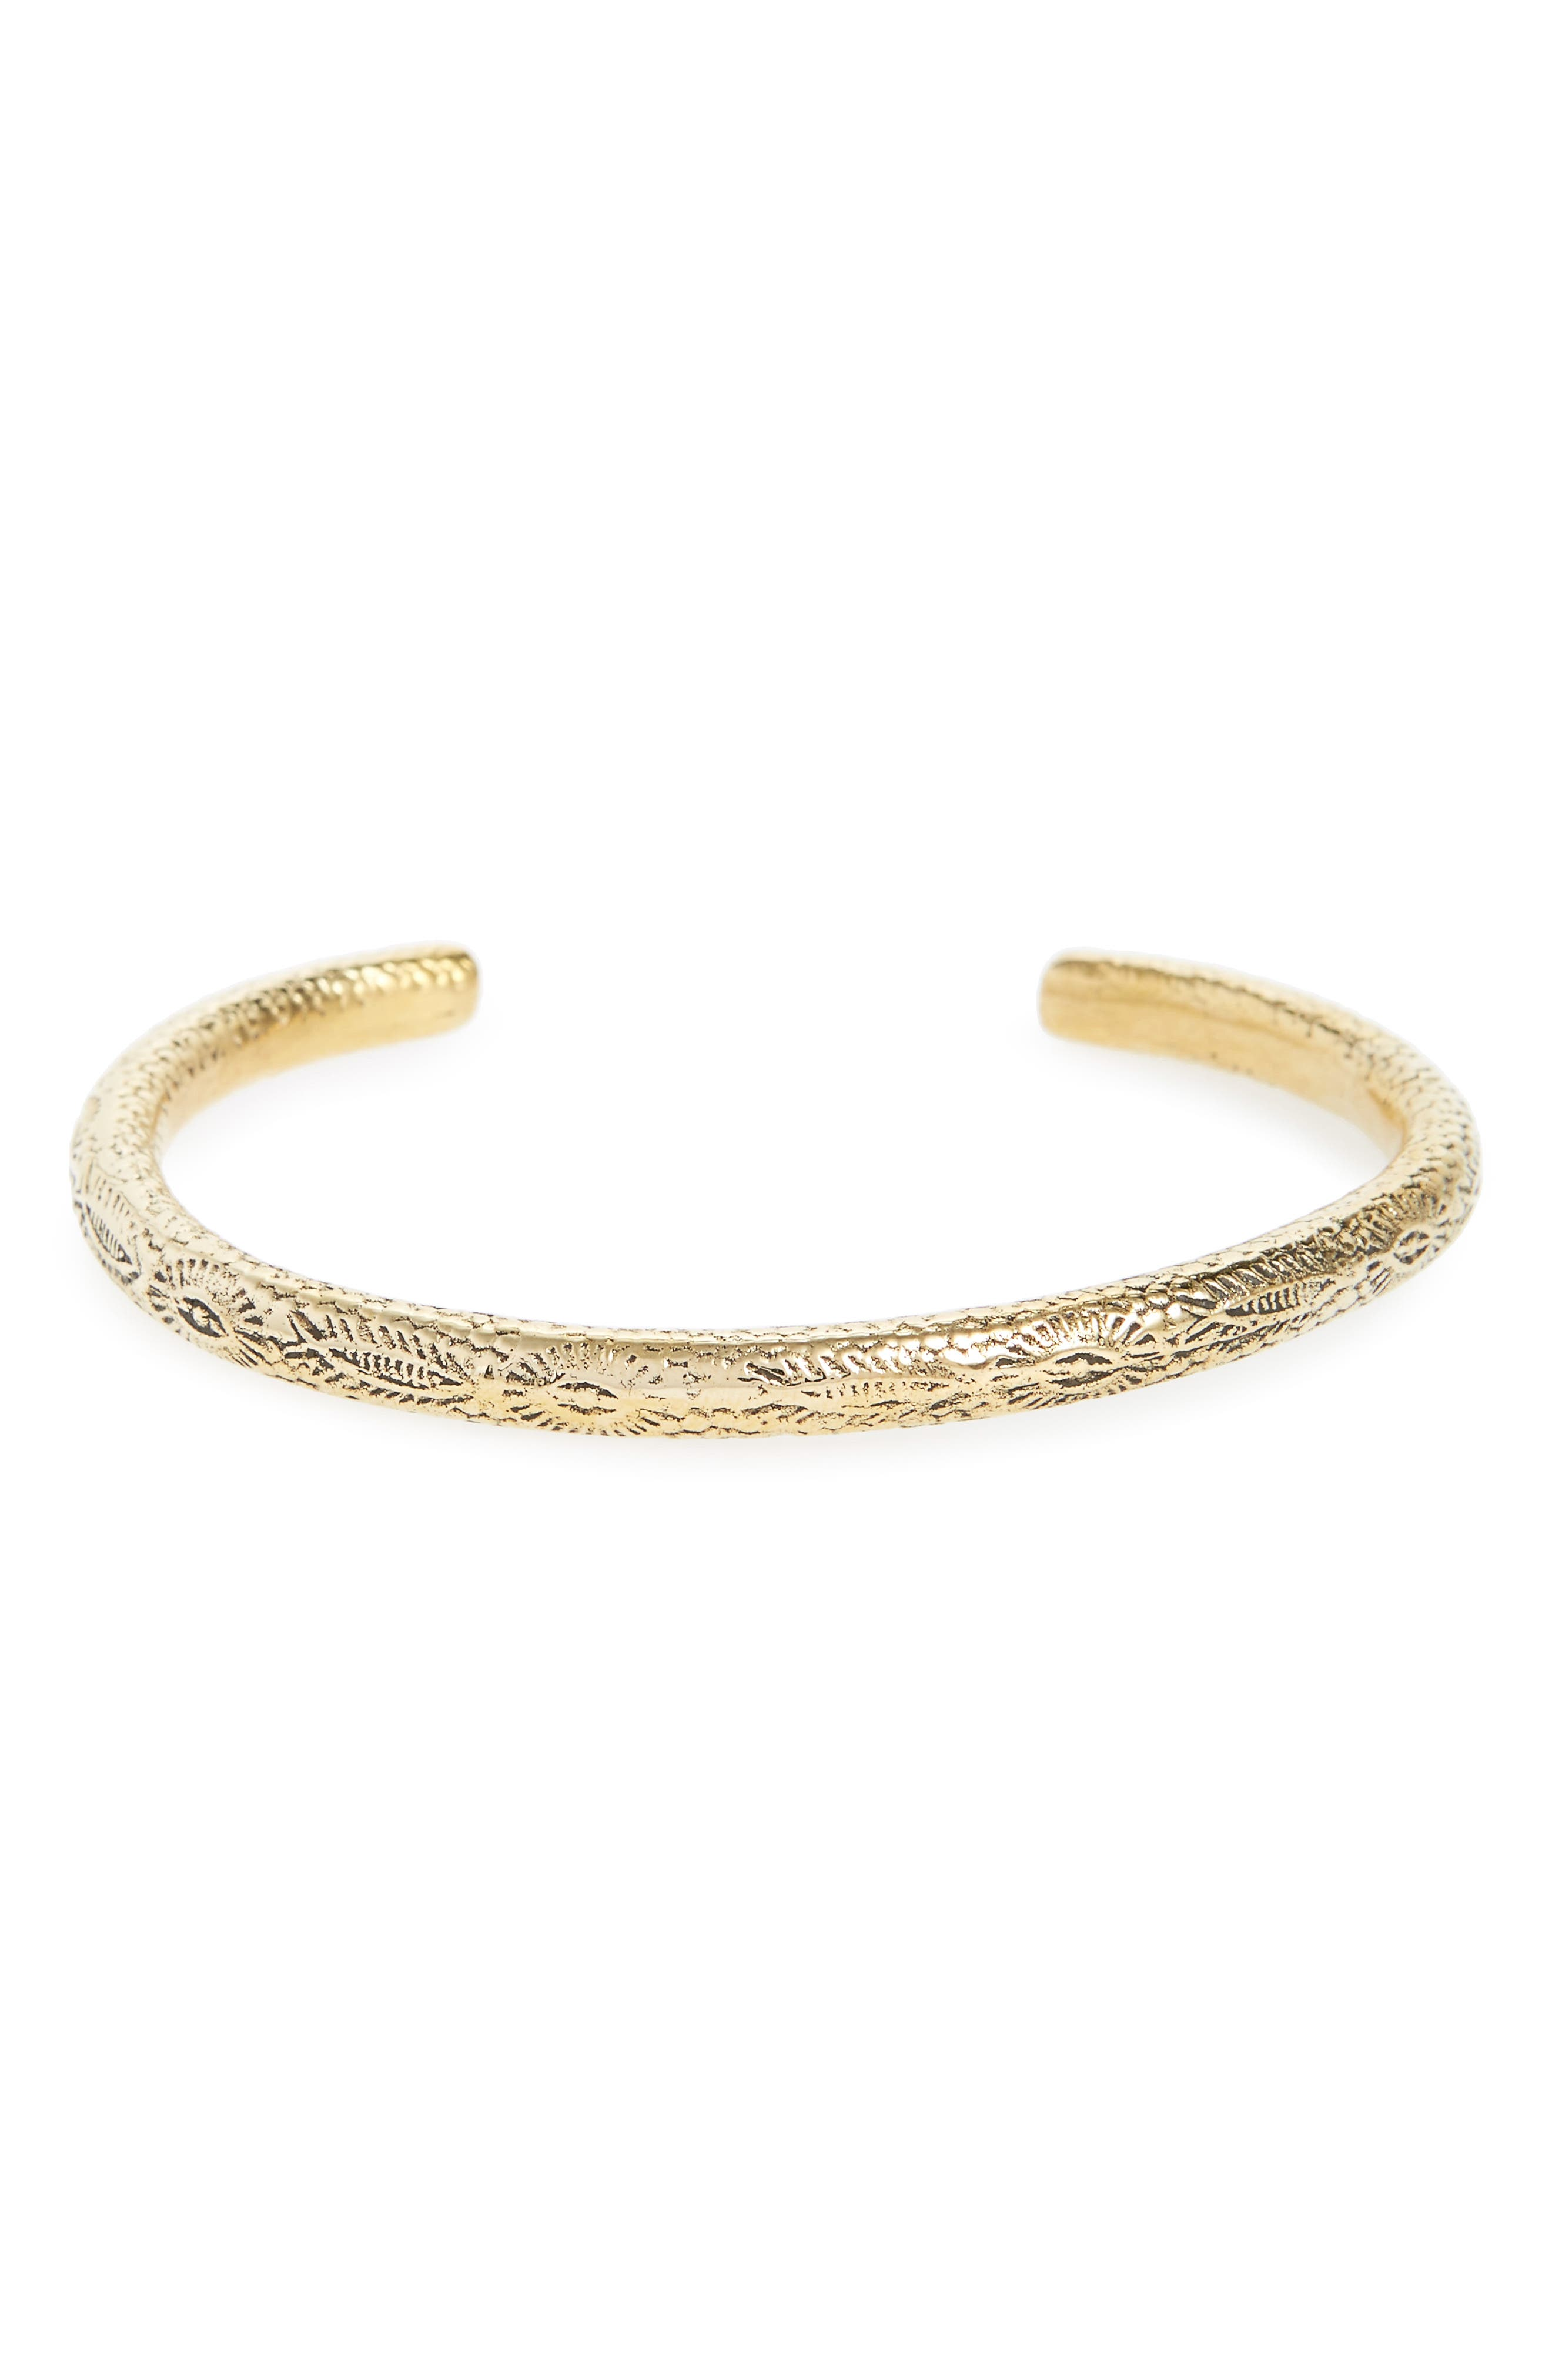 Caputo & Co. Third Eye Brass Cuff Bracelet